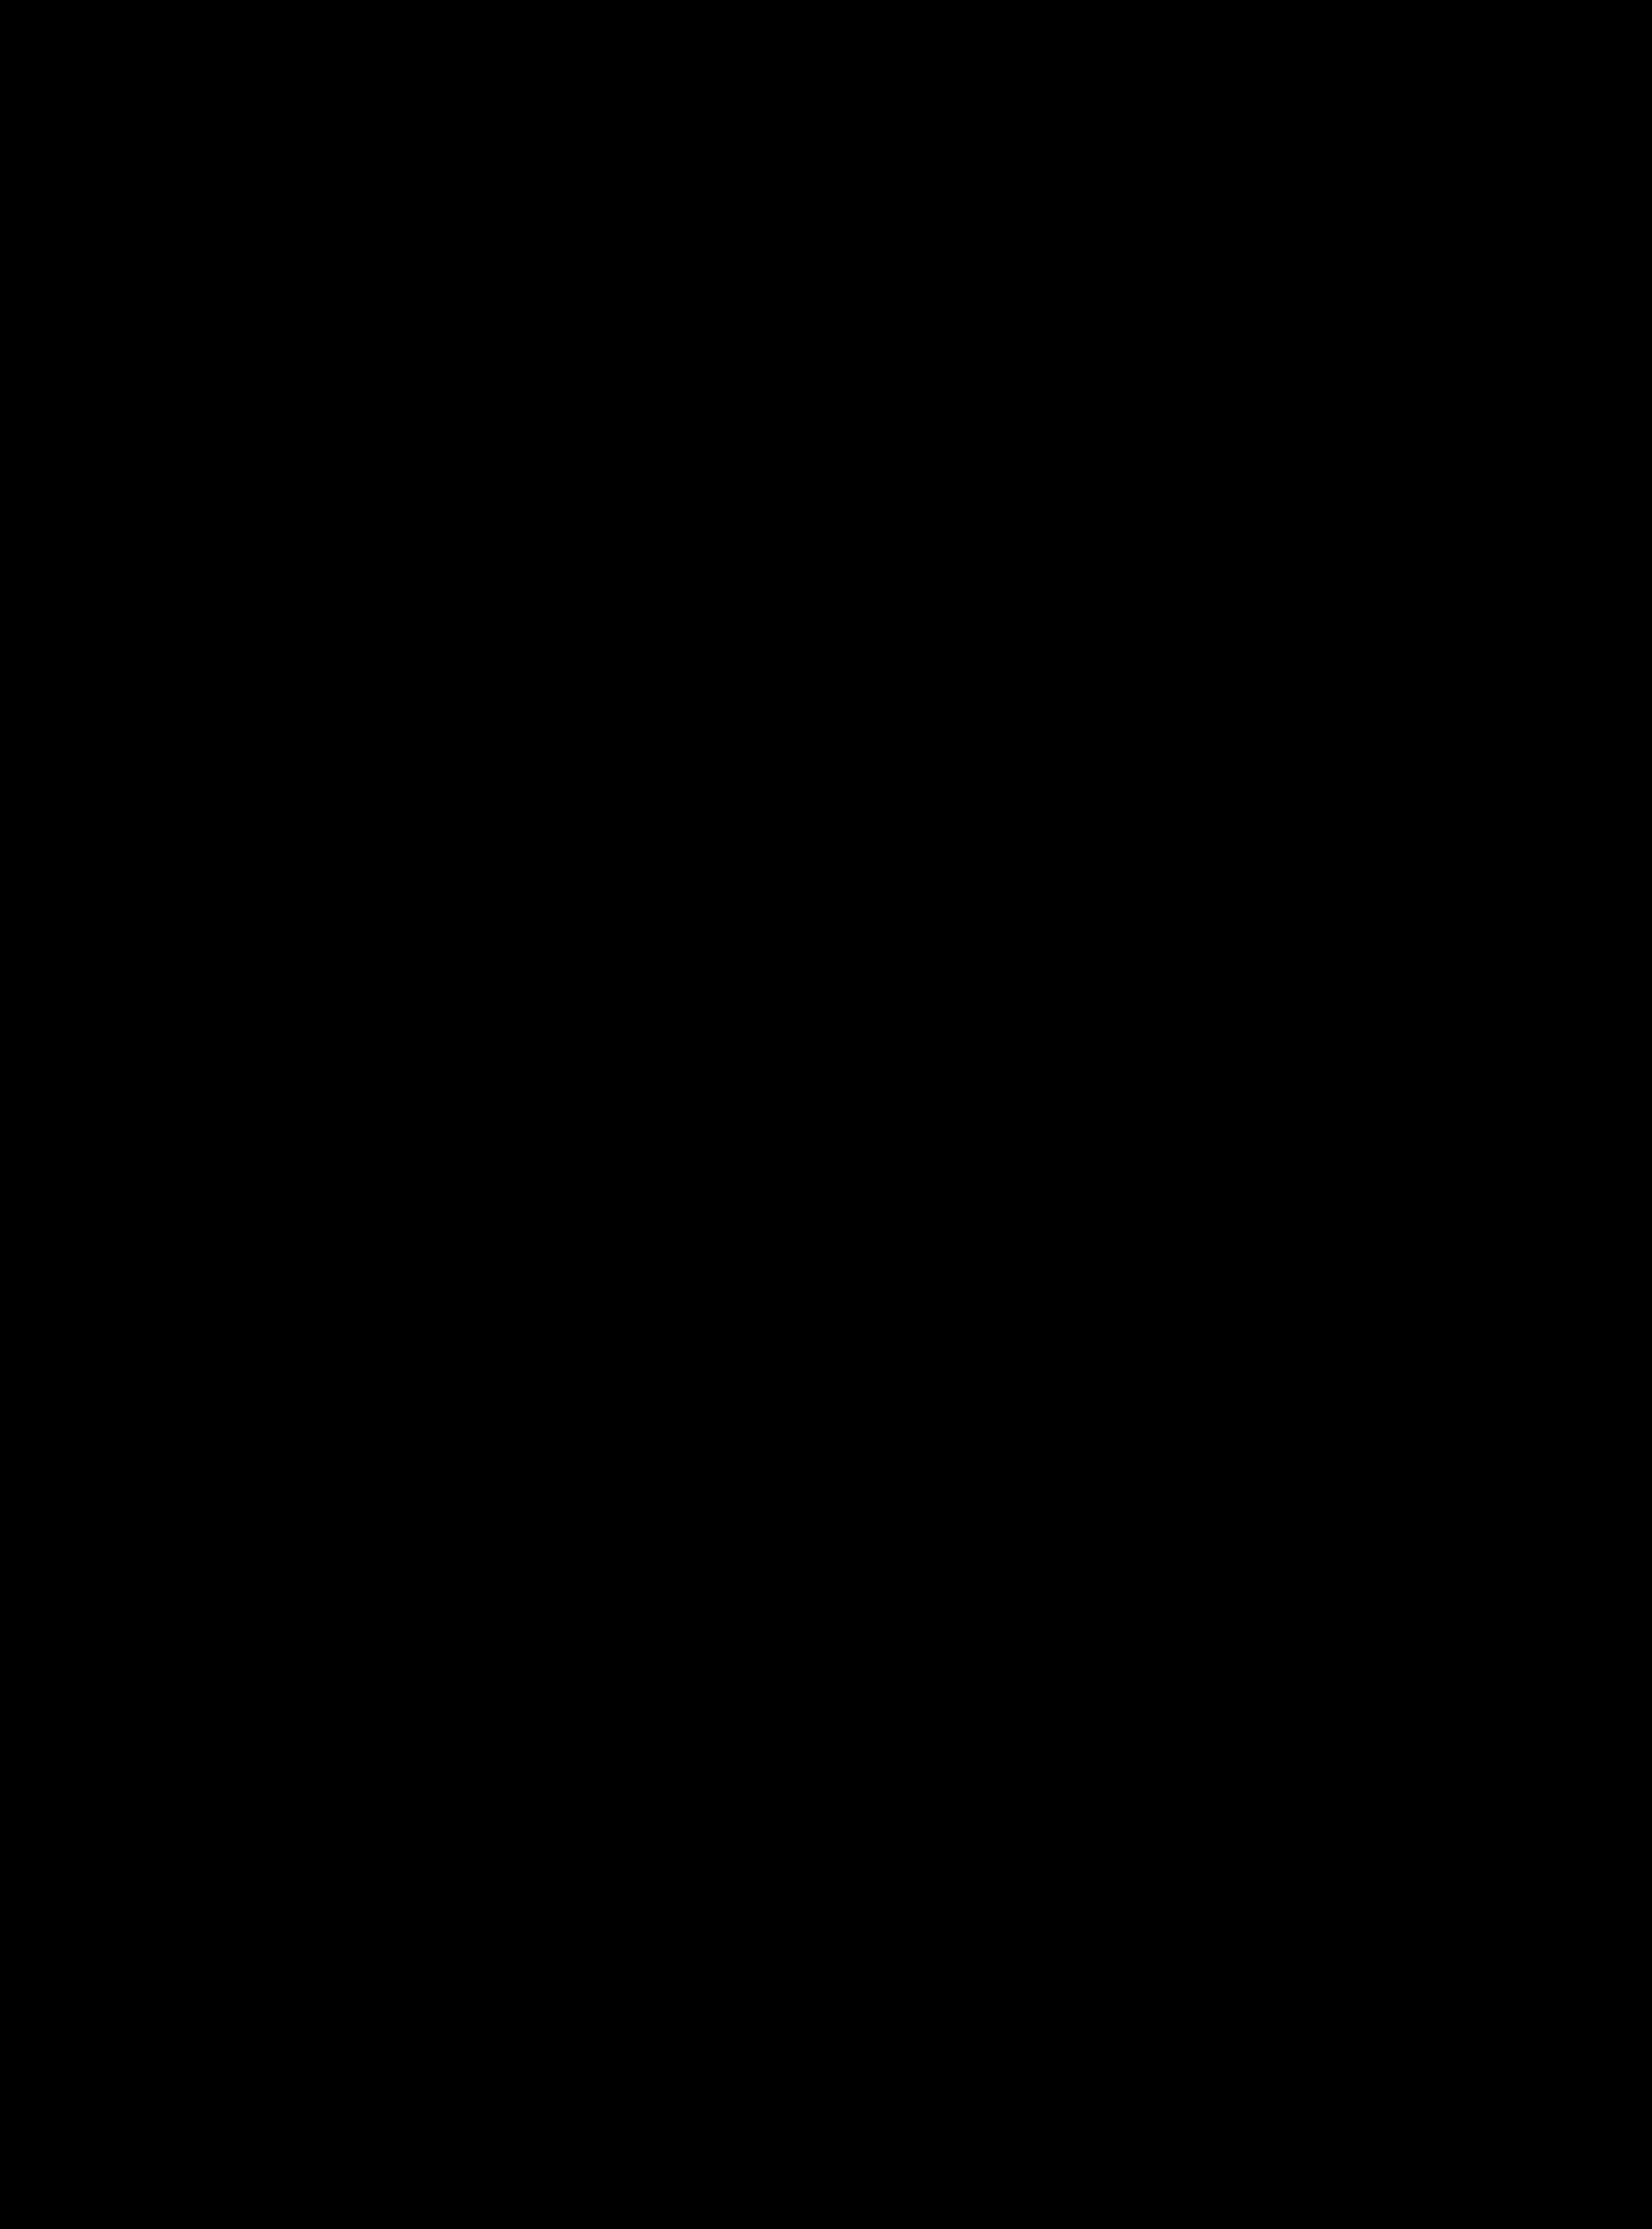 Profile silhouette big image. Tall clipart male model